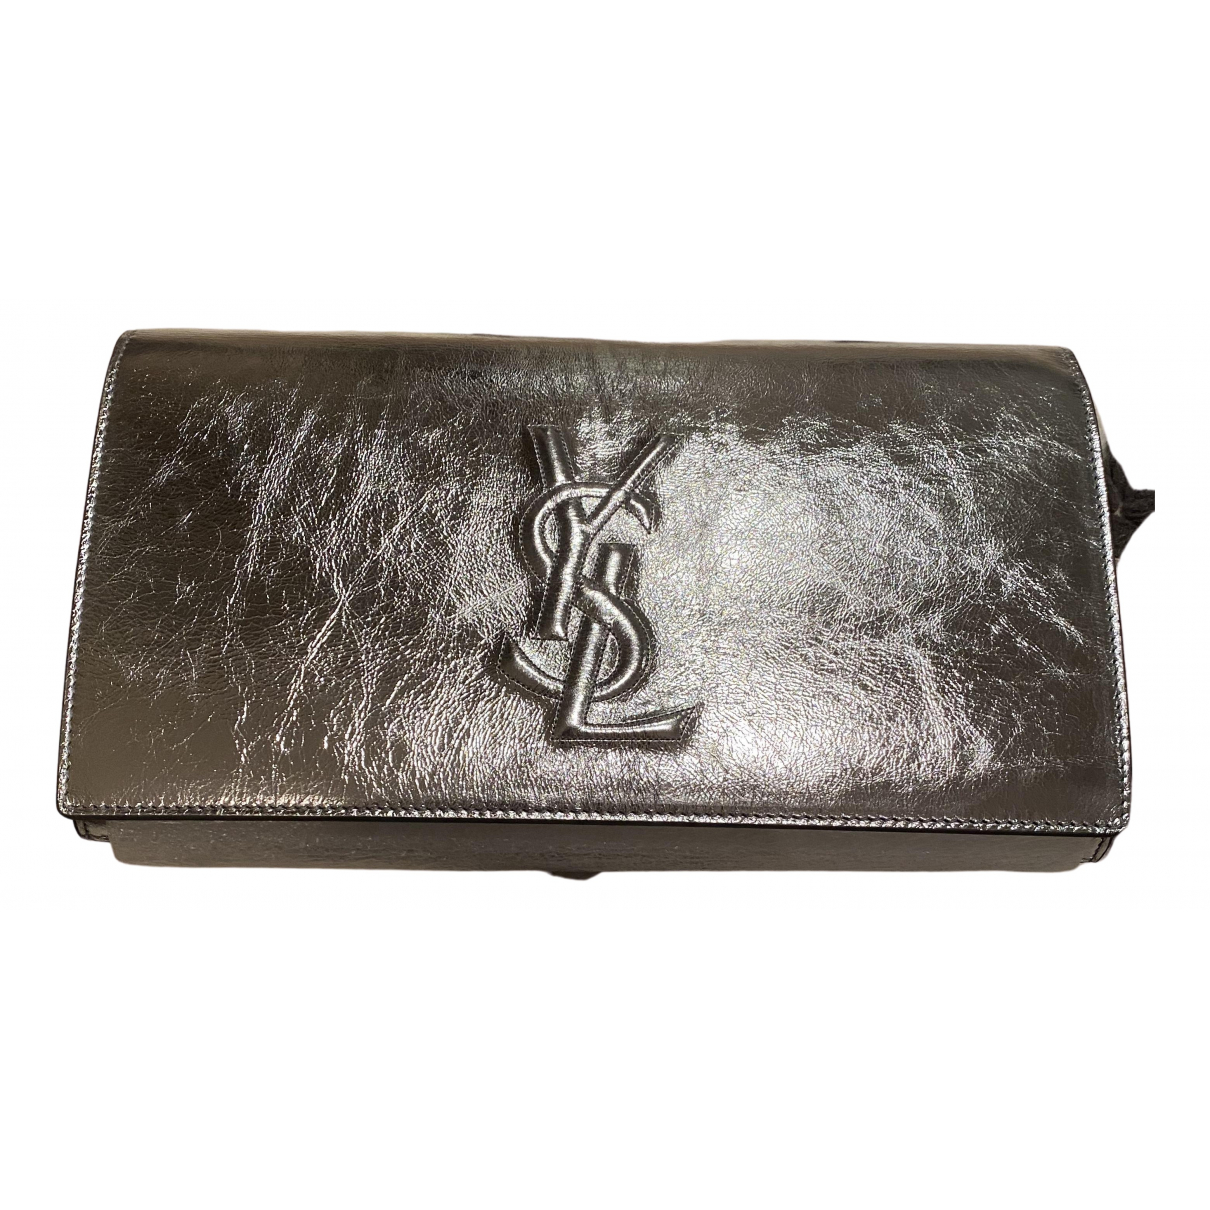 Yves Saint Laurent Belle de Jour Clutch in  Silber Lackleder